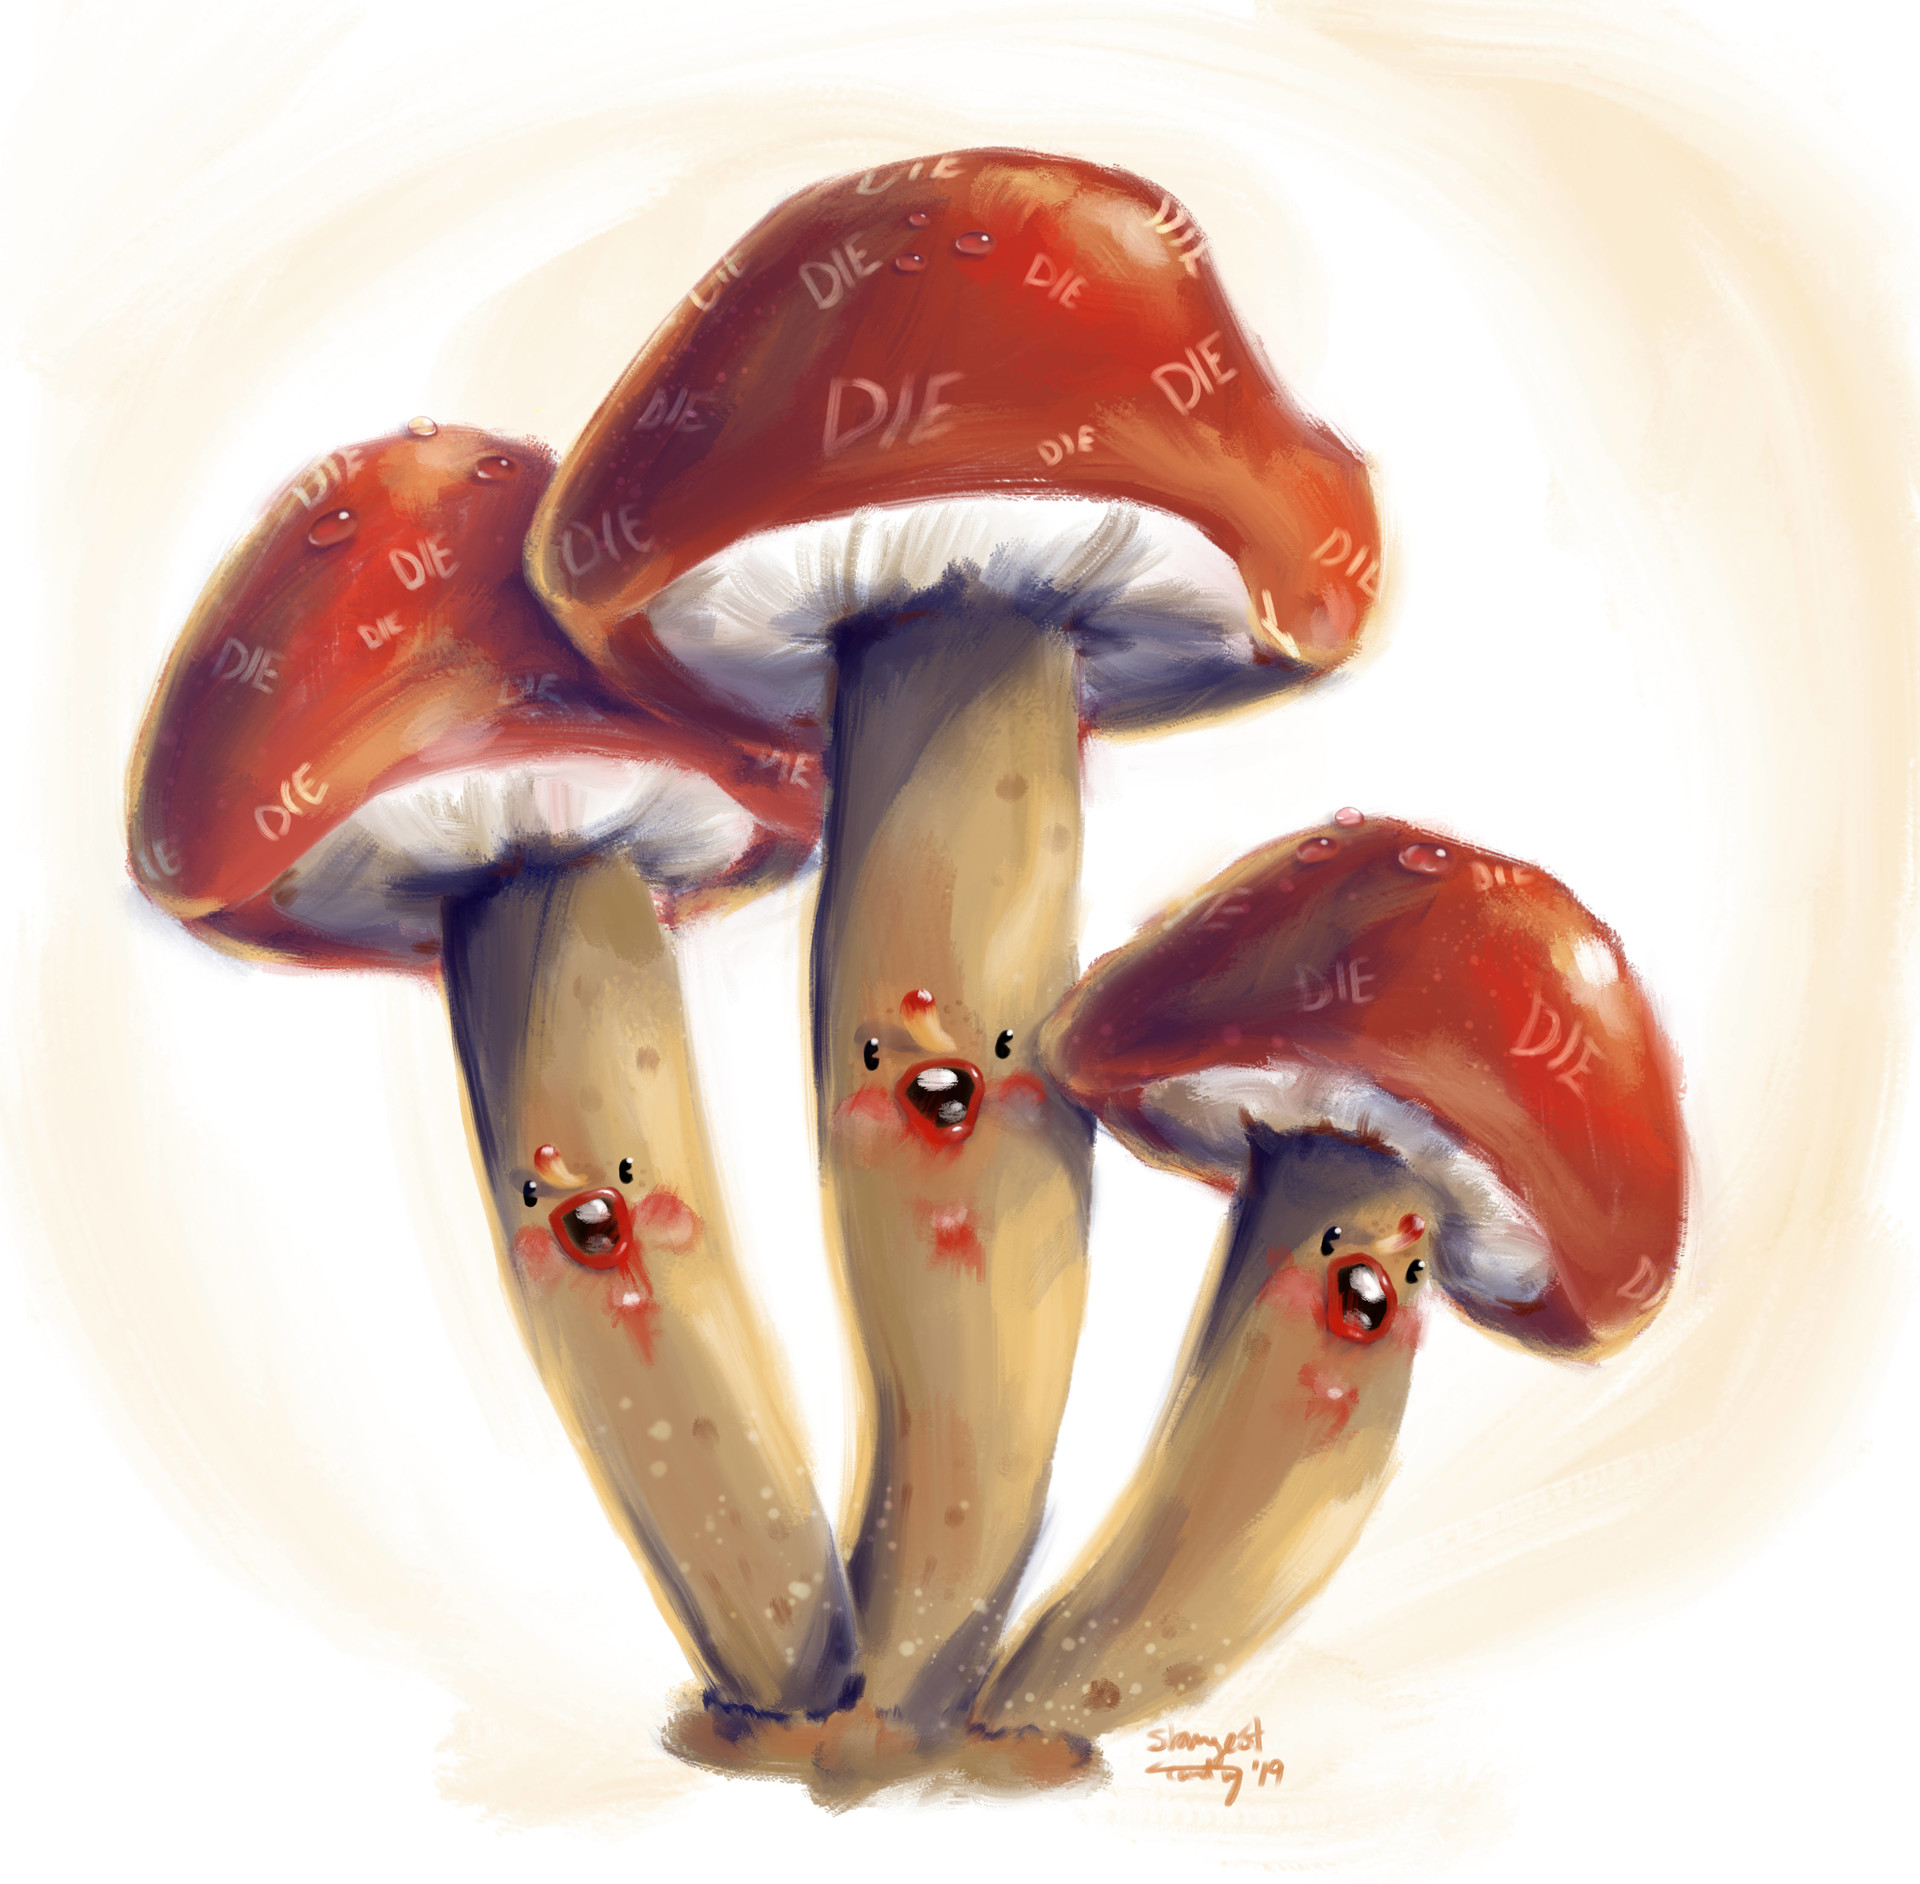 Strangest candy mushroomsgroup